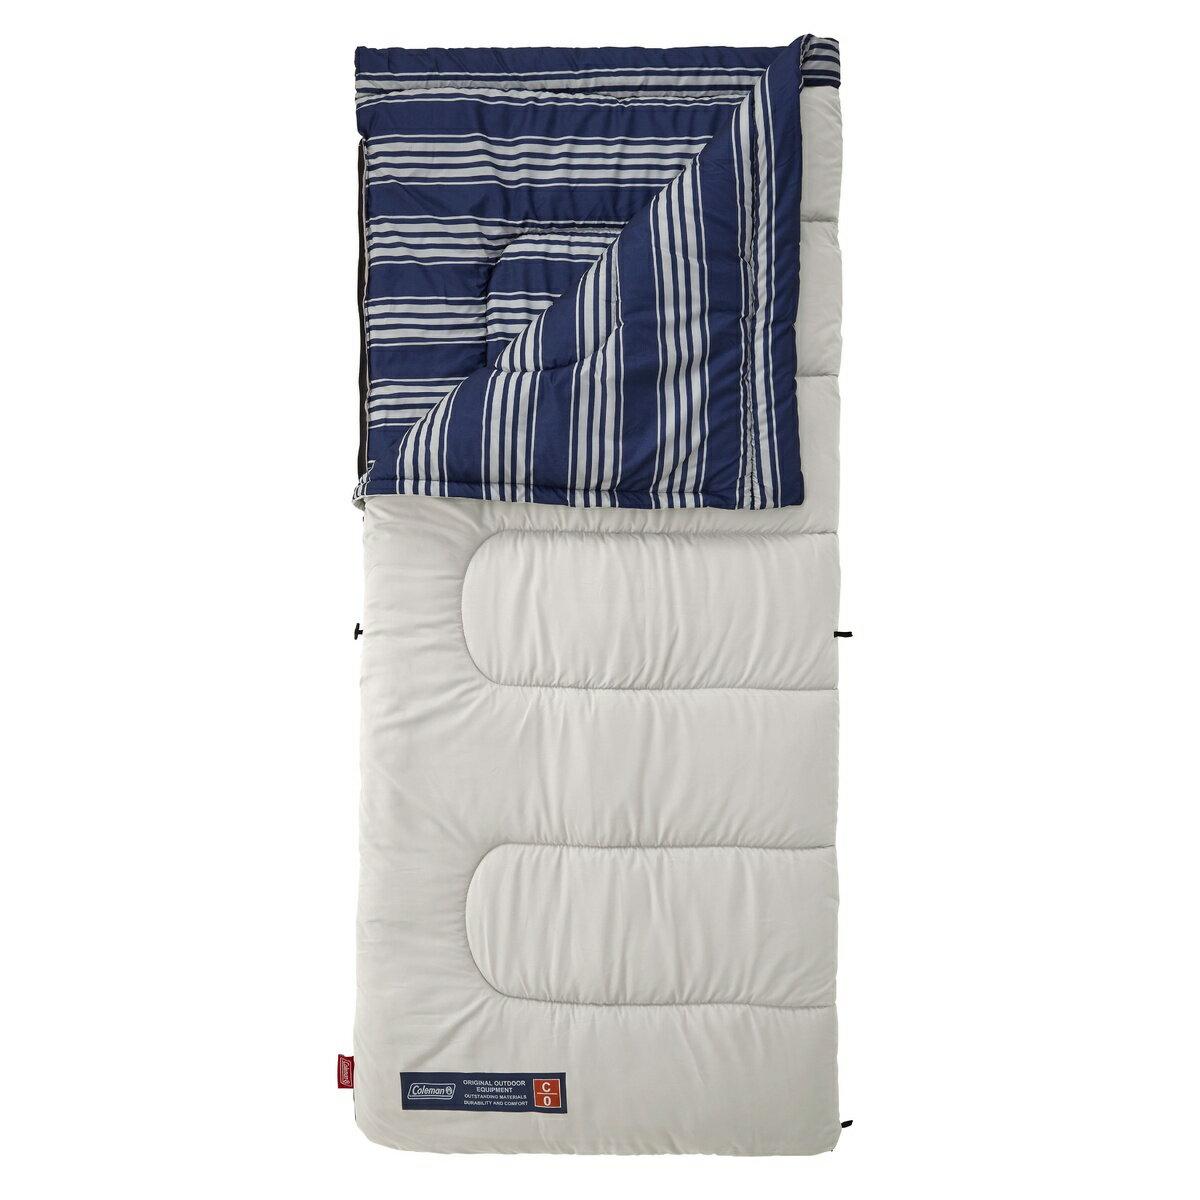 COLEMAN (コールマン) キャンプ用品 スリーピングバッグ 寝袋 封筒型 フリースフットEZキャリースリーピングバッグ/C0 2000031097